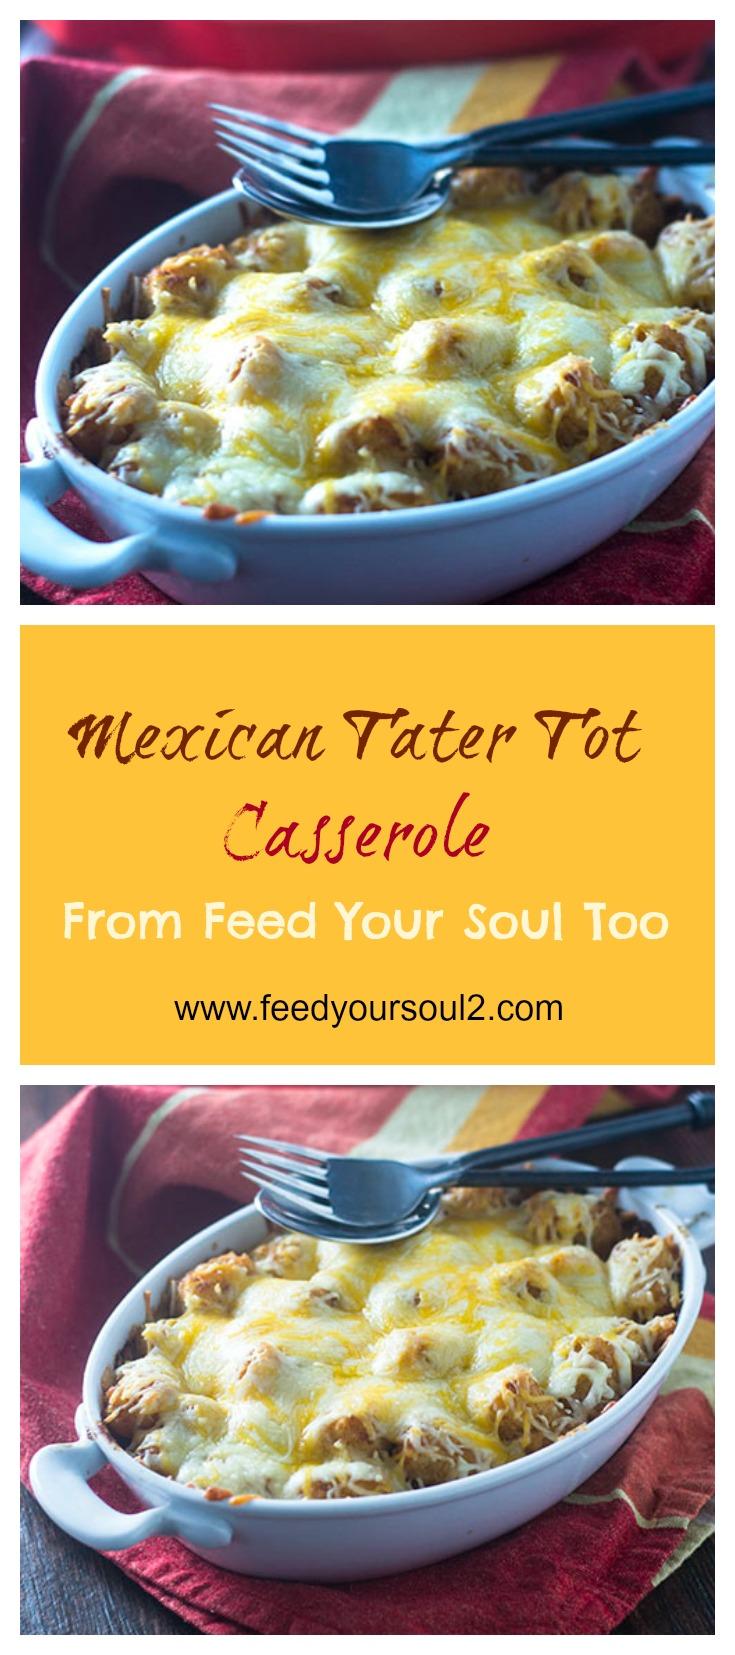 Mexican Tater Tot Casserole #Dinner #comfortfood #Mexicanrecipe #casserole | feedyoursoul2.com